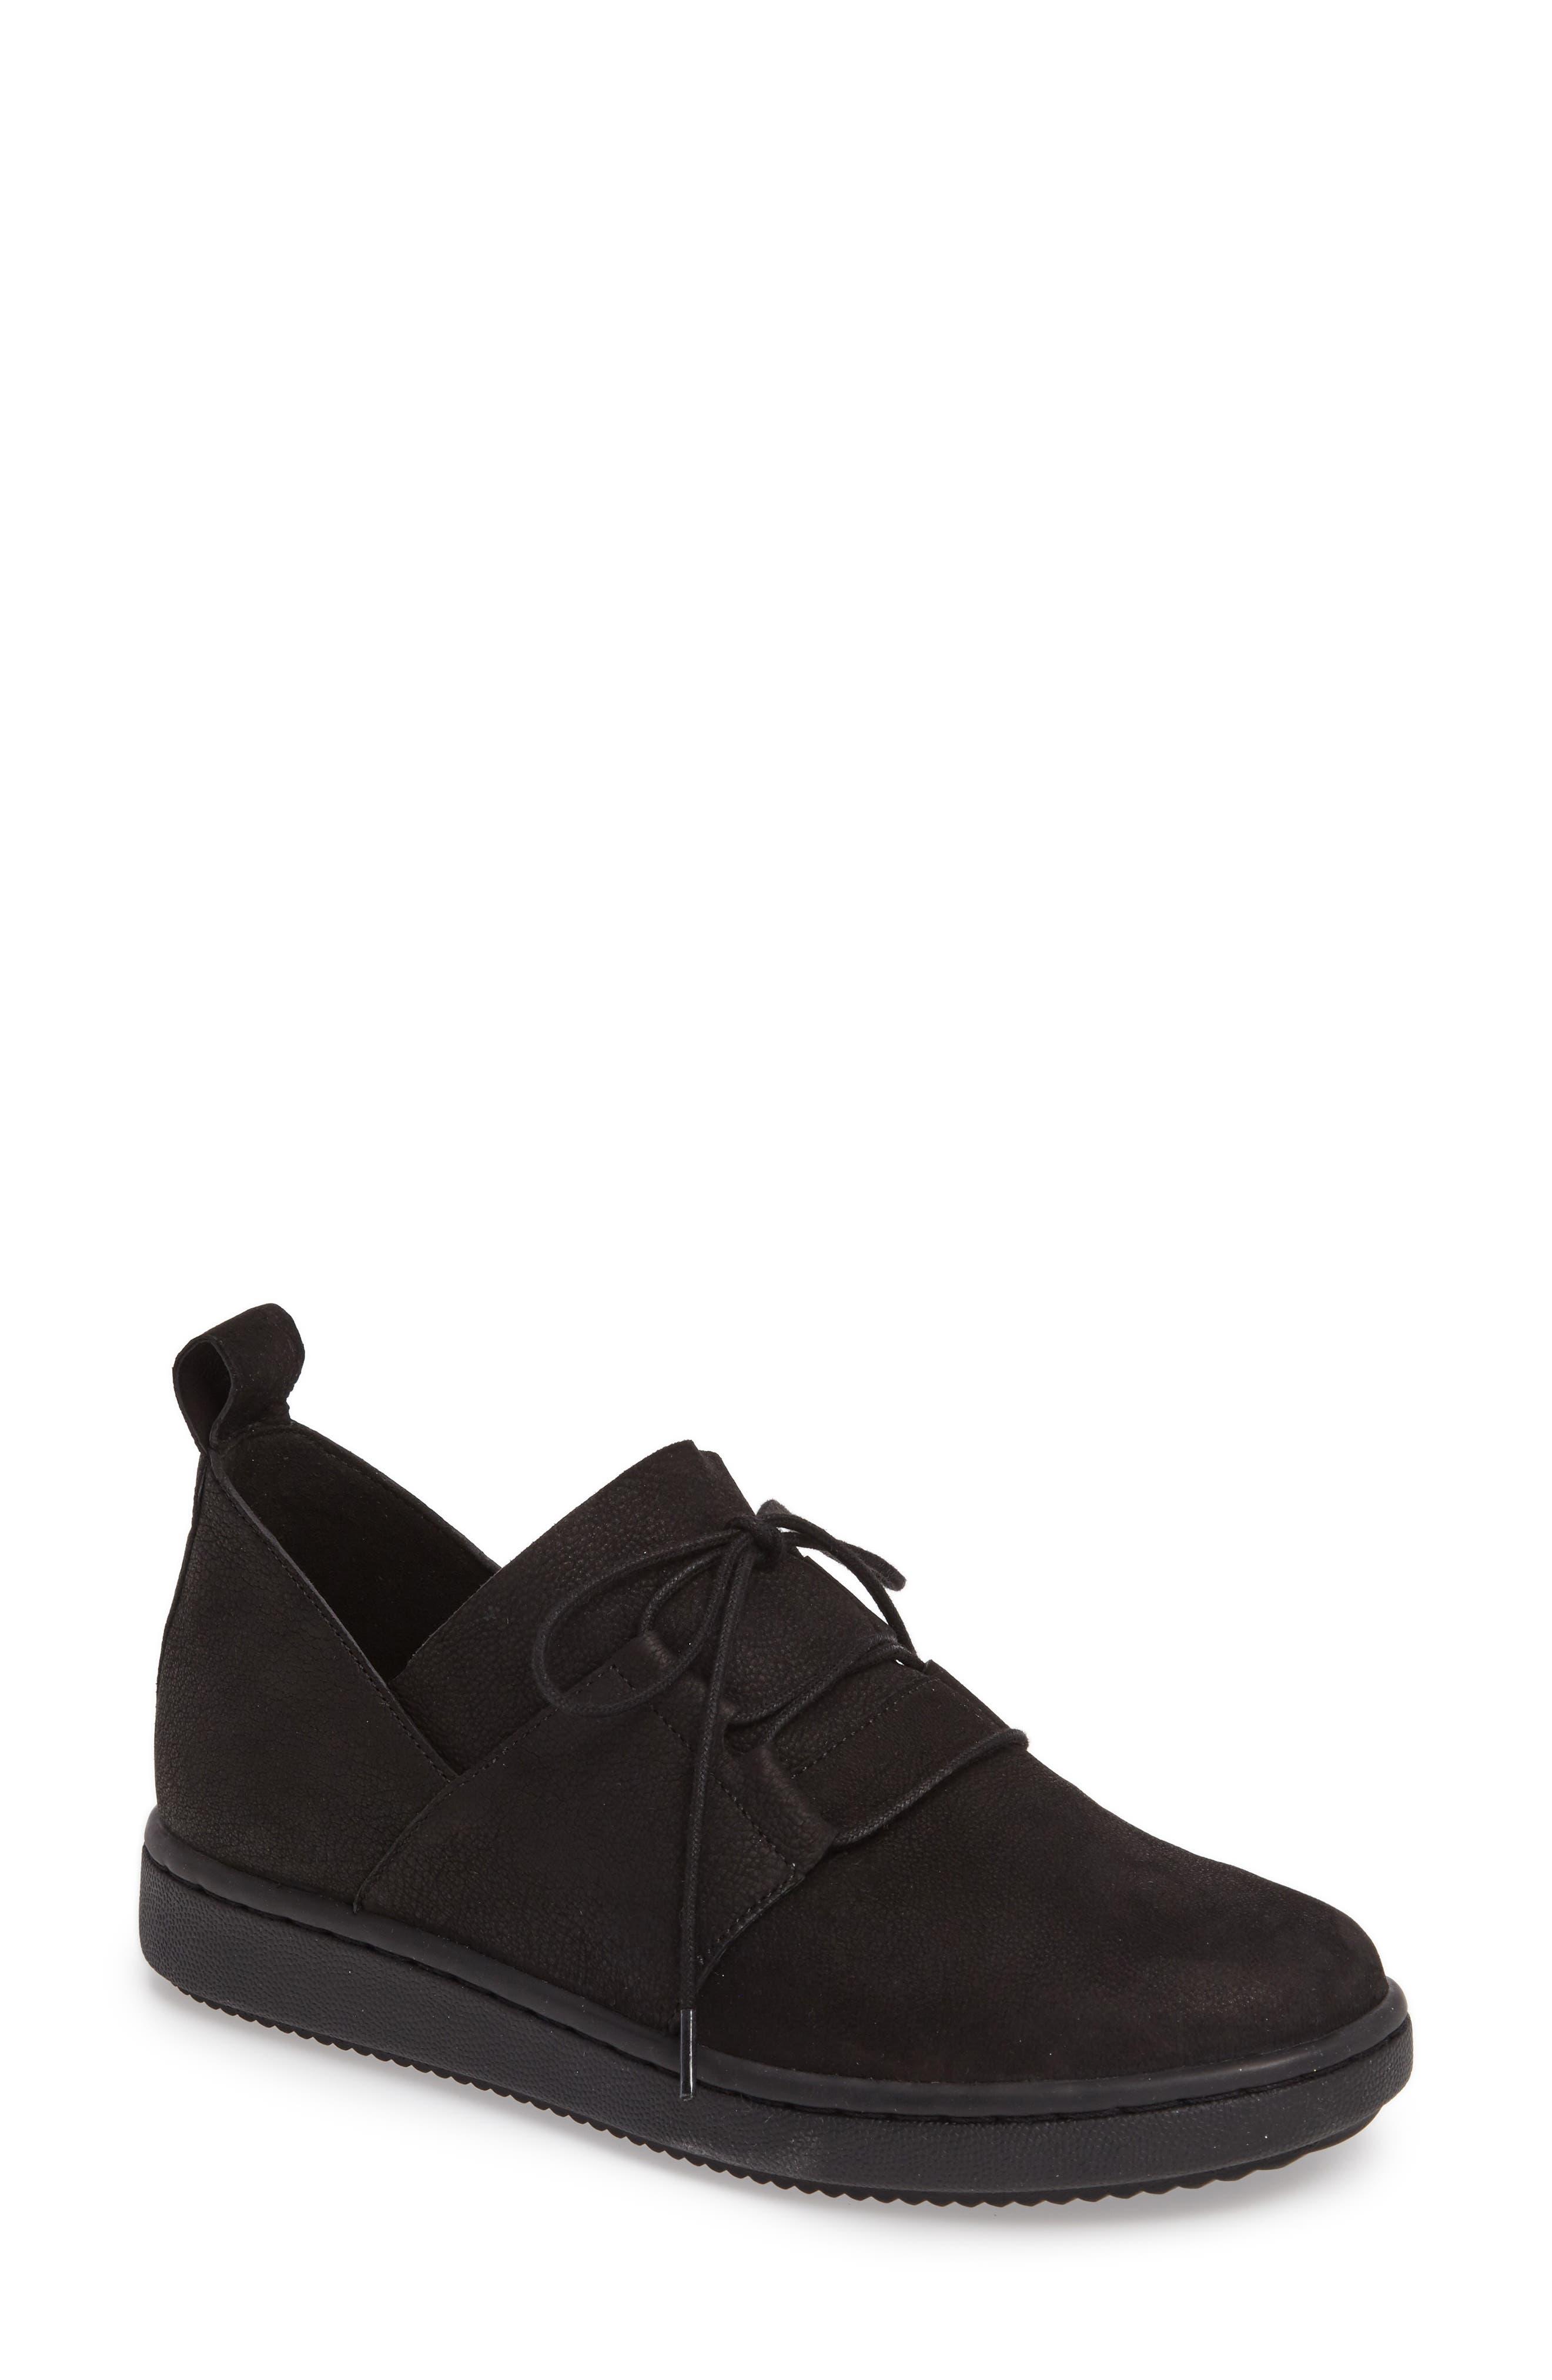 Kipling Sneaker,                             Main thumbnail 1, color,                             001